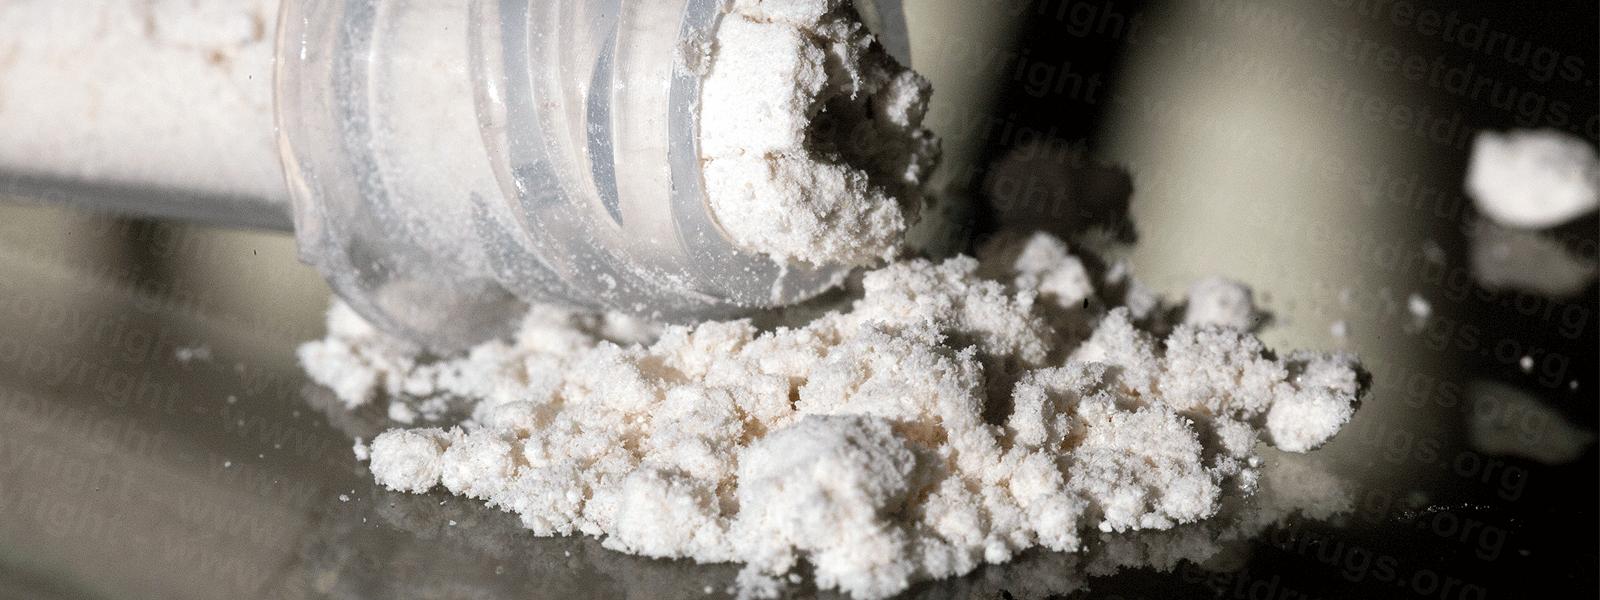 Test Foil Meth